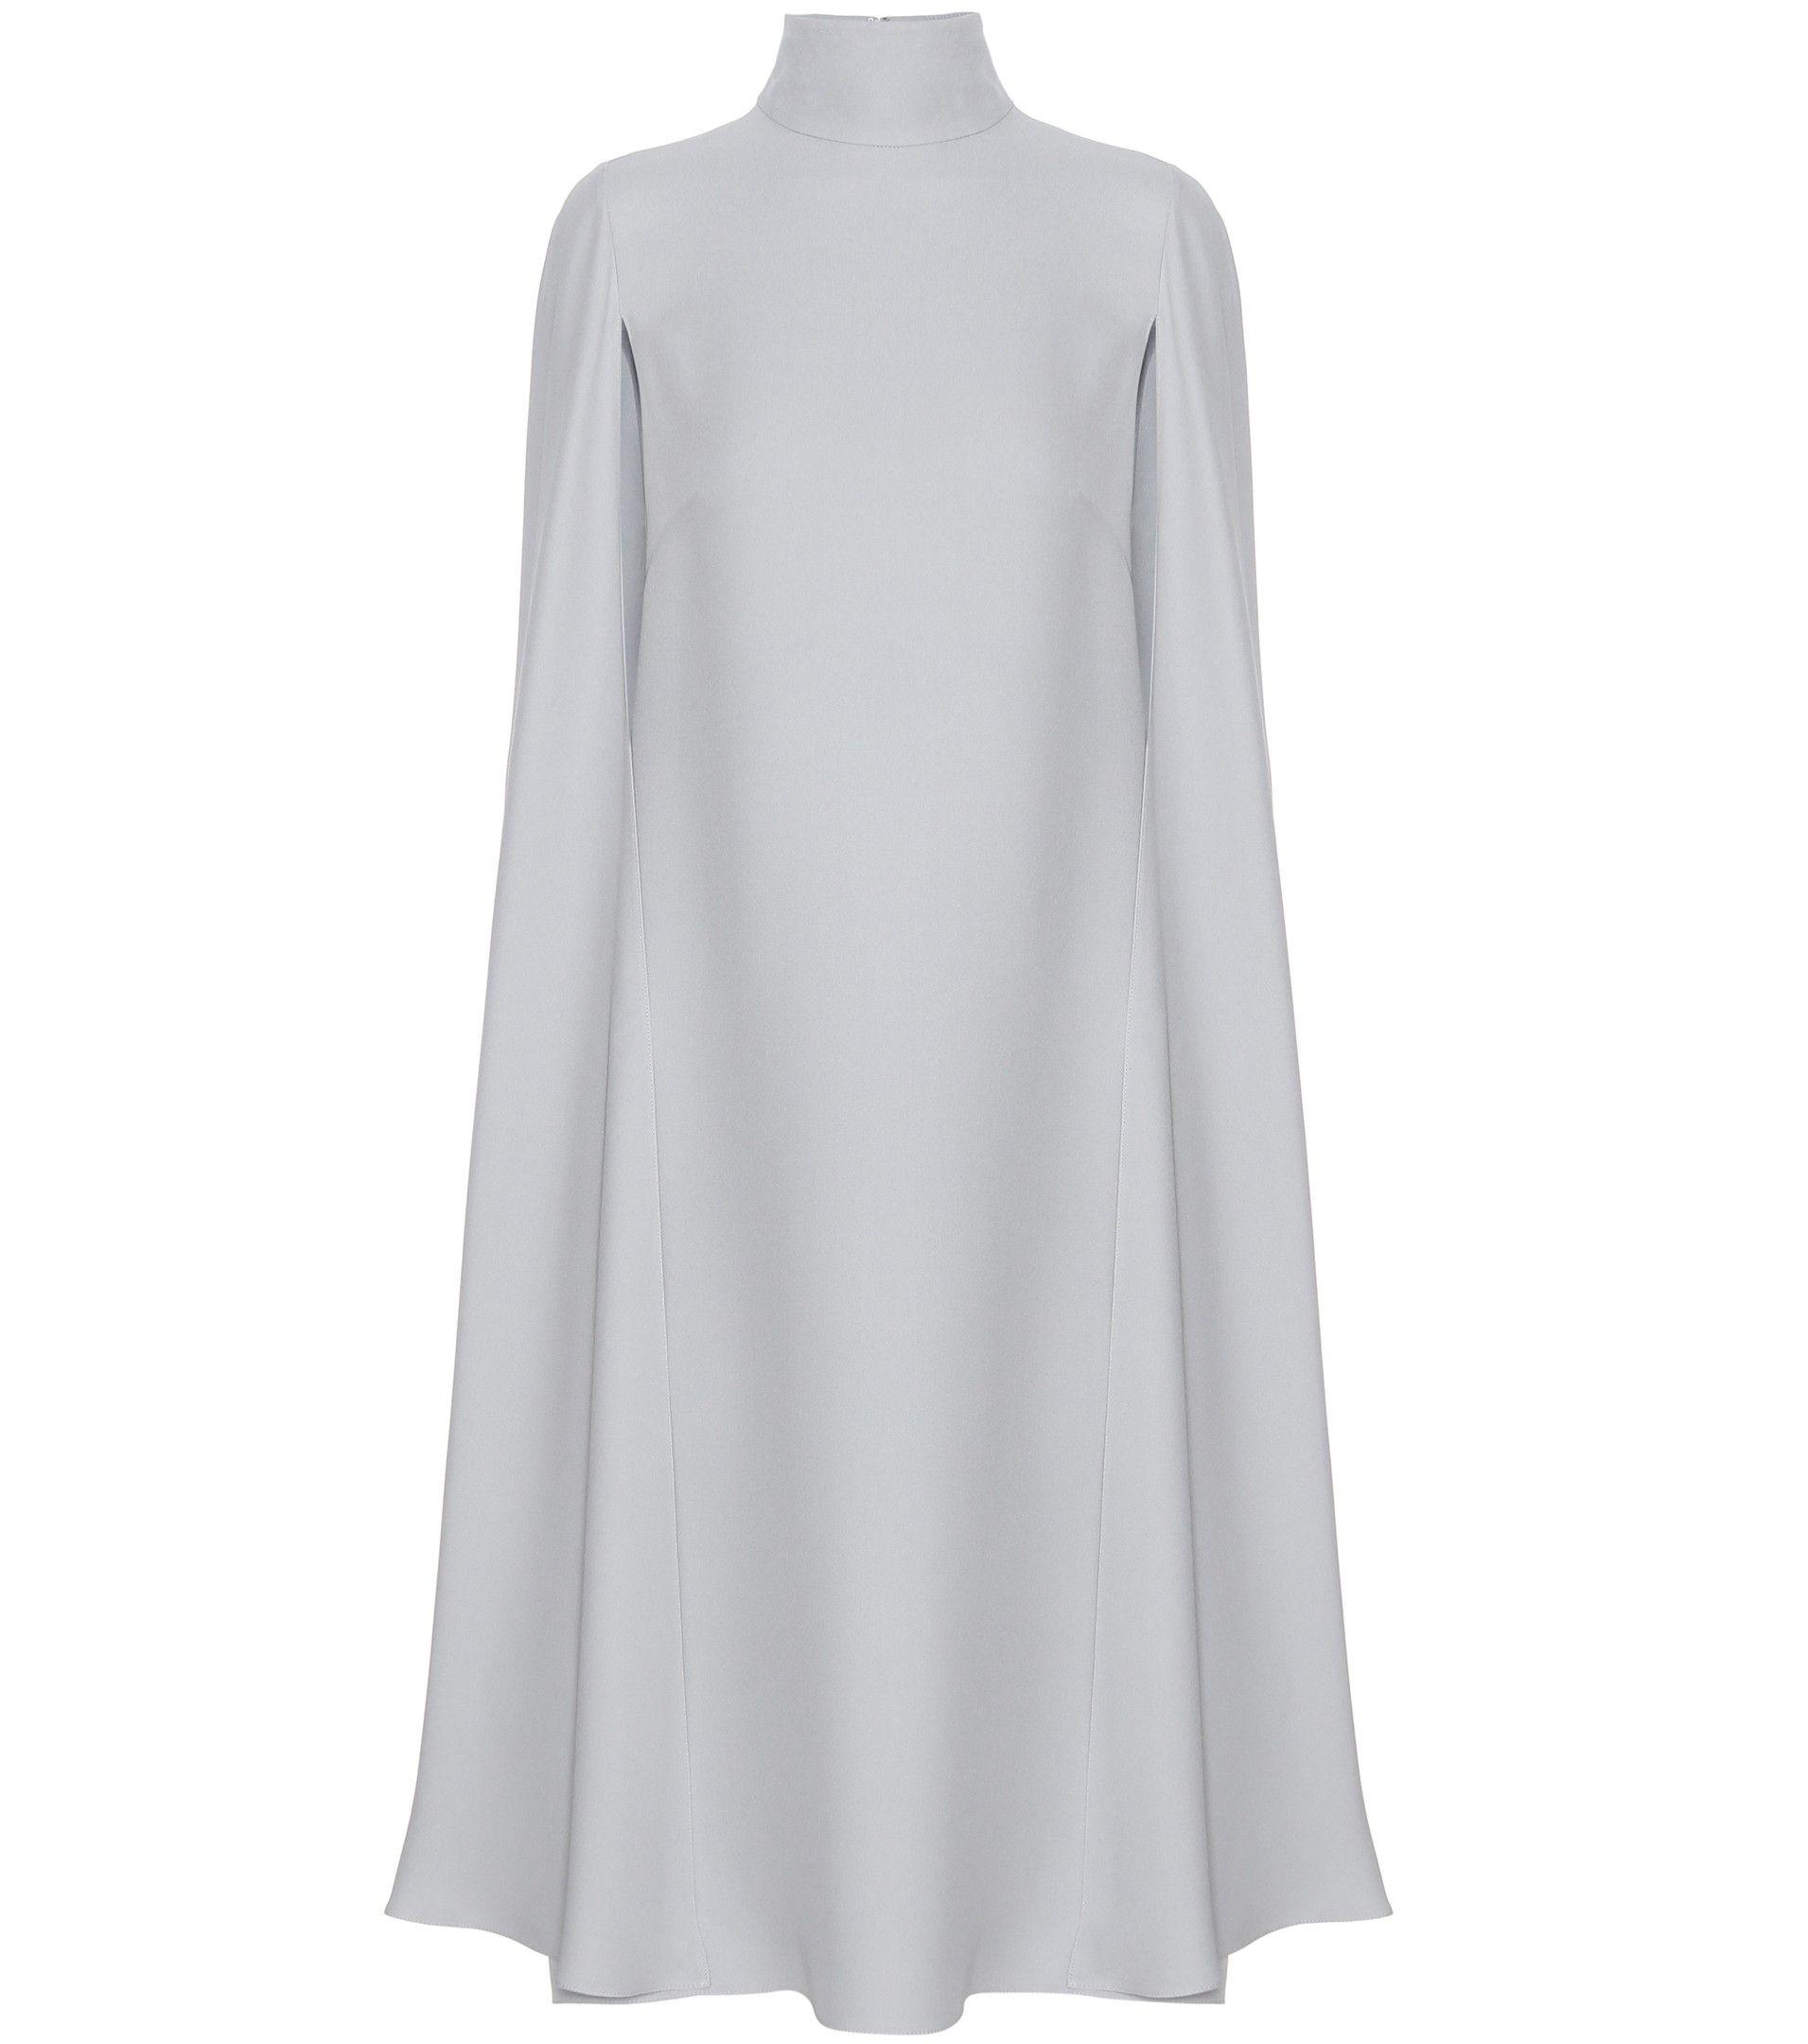 mytheresa.com - Sleeveless silk dress - Dresses - Clothing - Luxury Fashion for Women / Designer clothing, shoes, bags